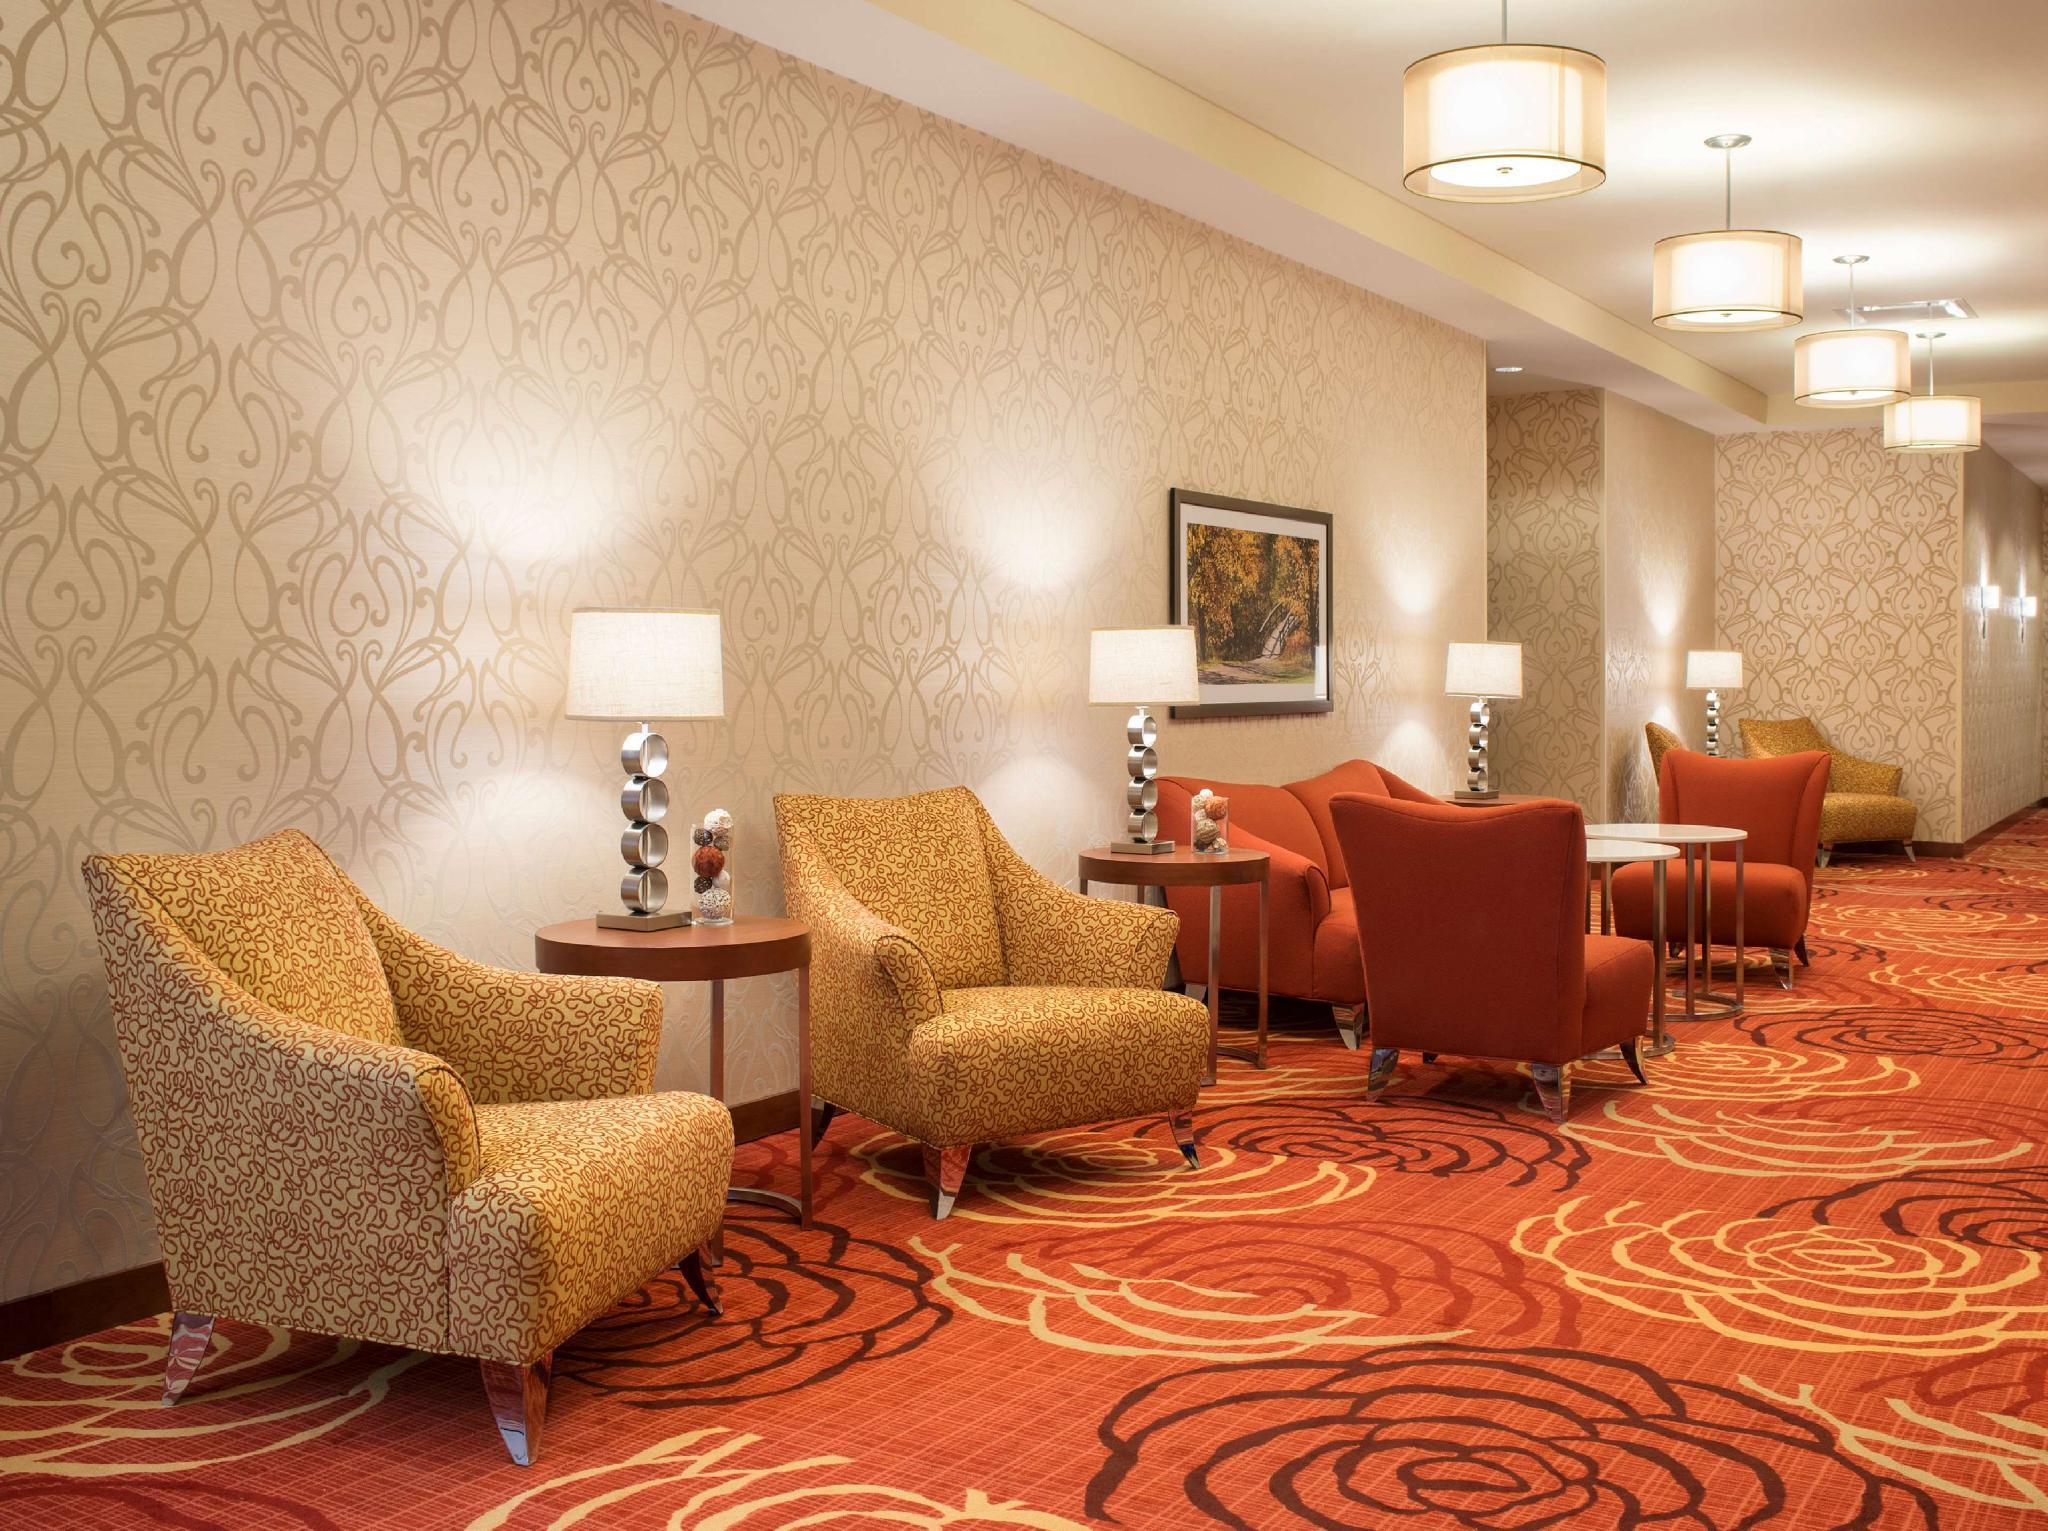 Homewood Suites by Hilton Winnipeg Airport Polo Park Hotel